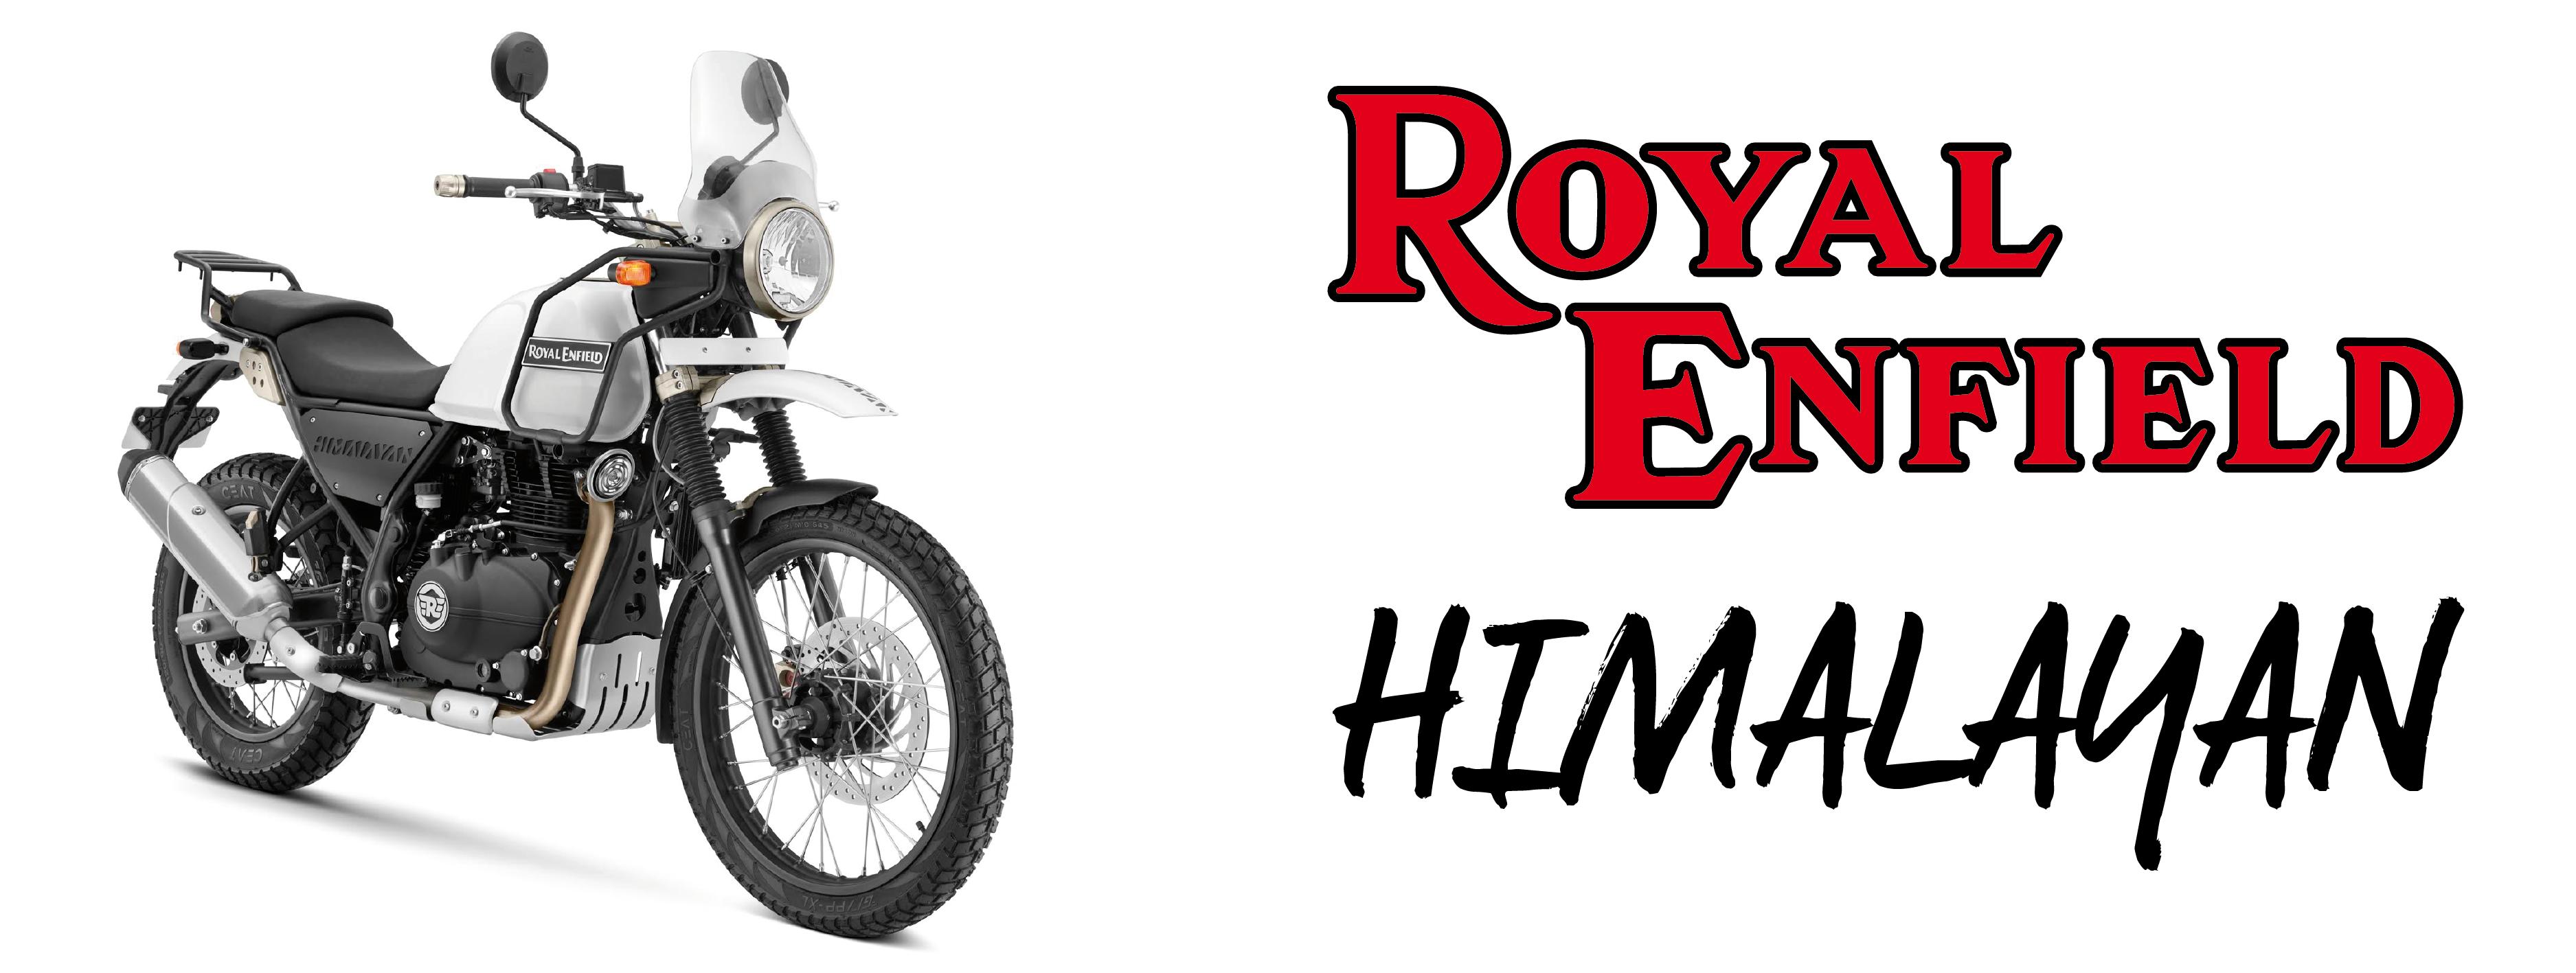 l 39 himalayan par royal enfield vintage motors magazine blog moto vintage lifestyle et actualit. Black Bedroom Furniture Sets. Home Design Ideas